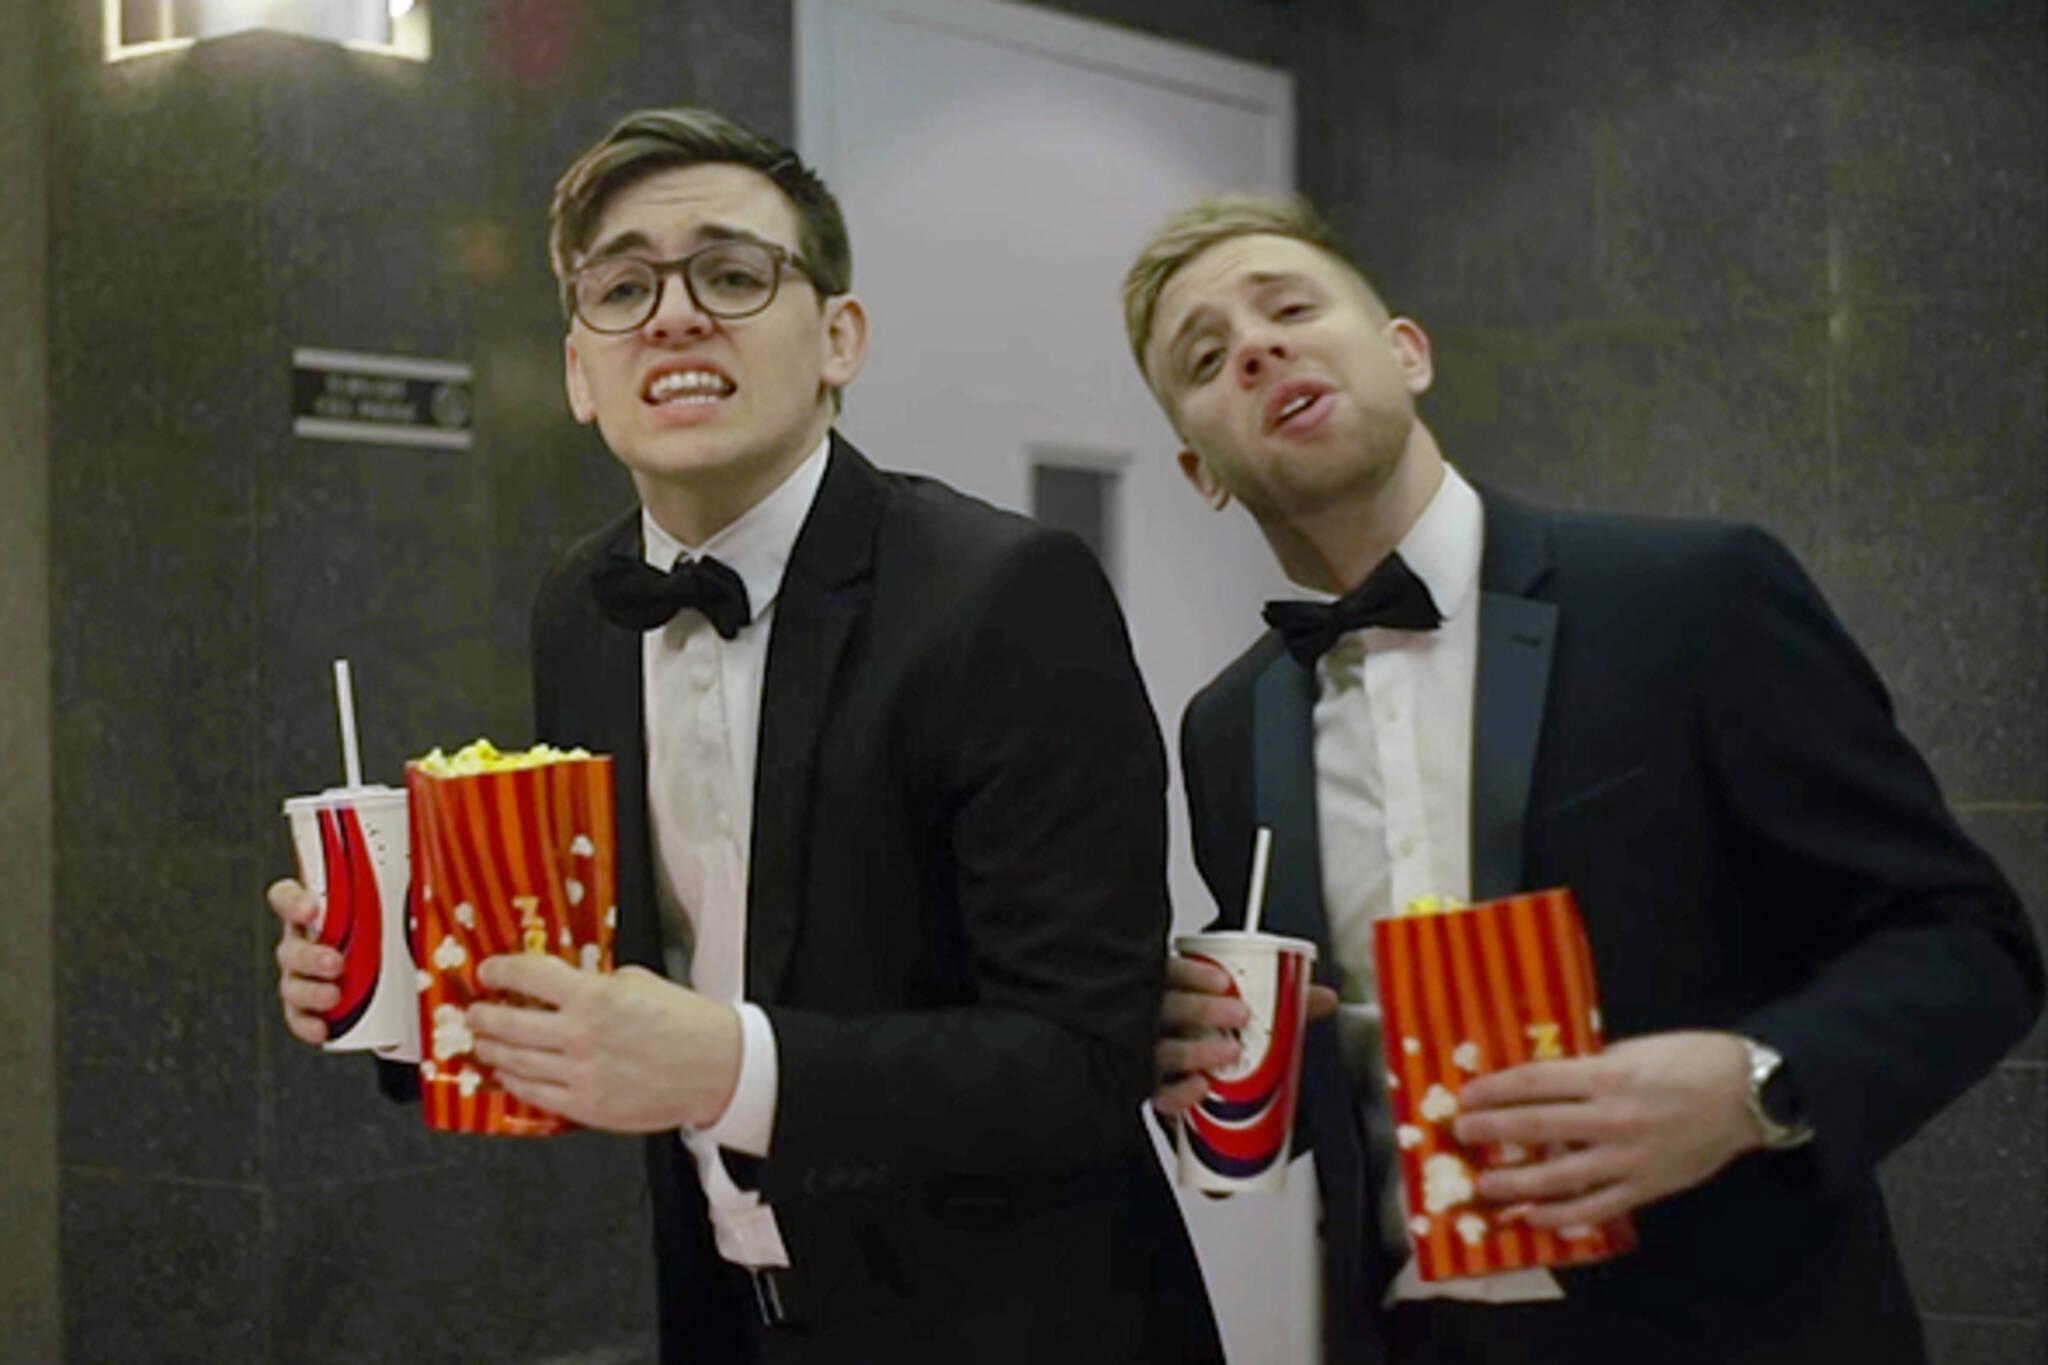 watch Oscars Toronto